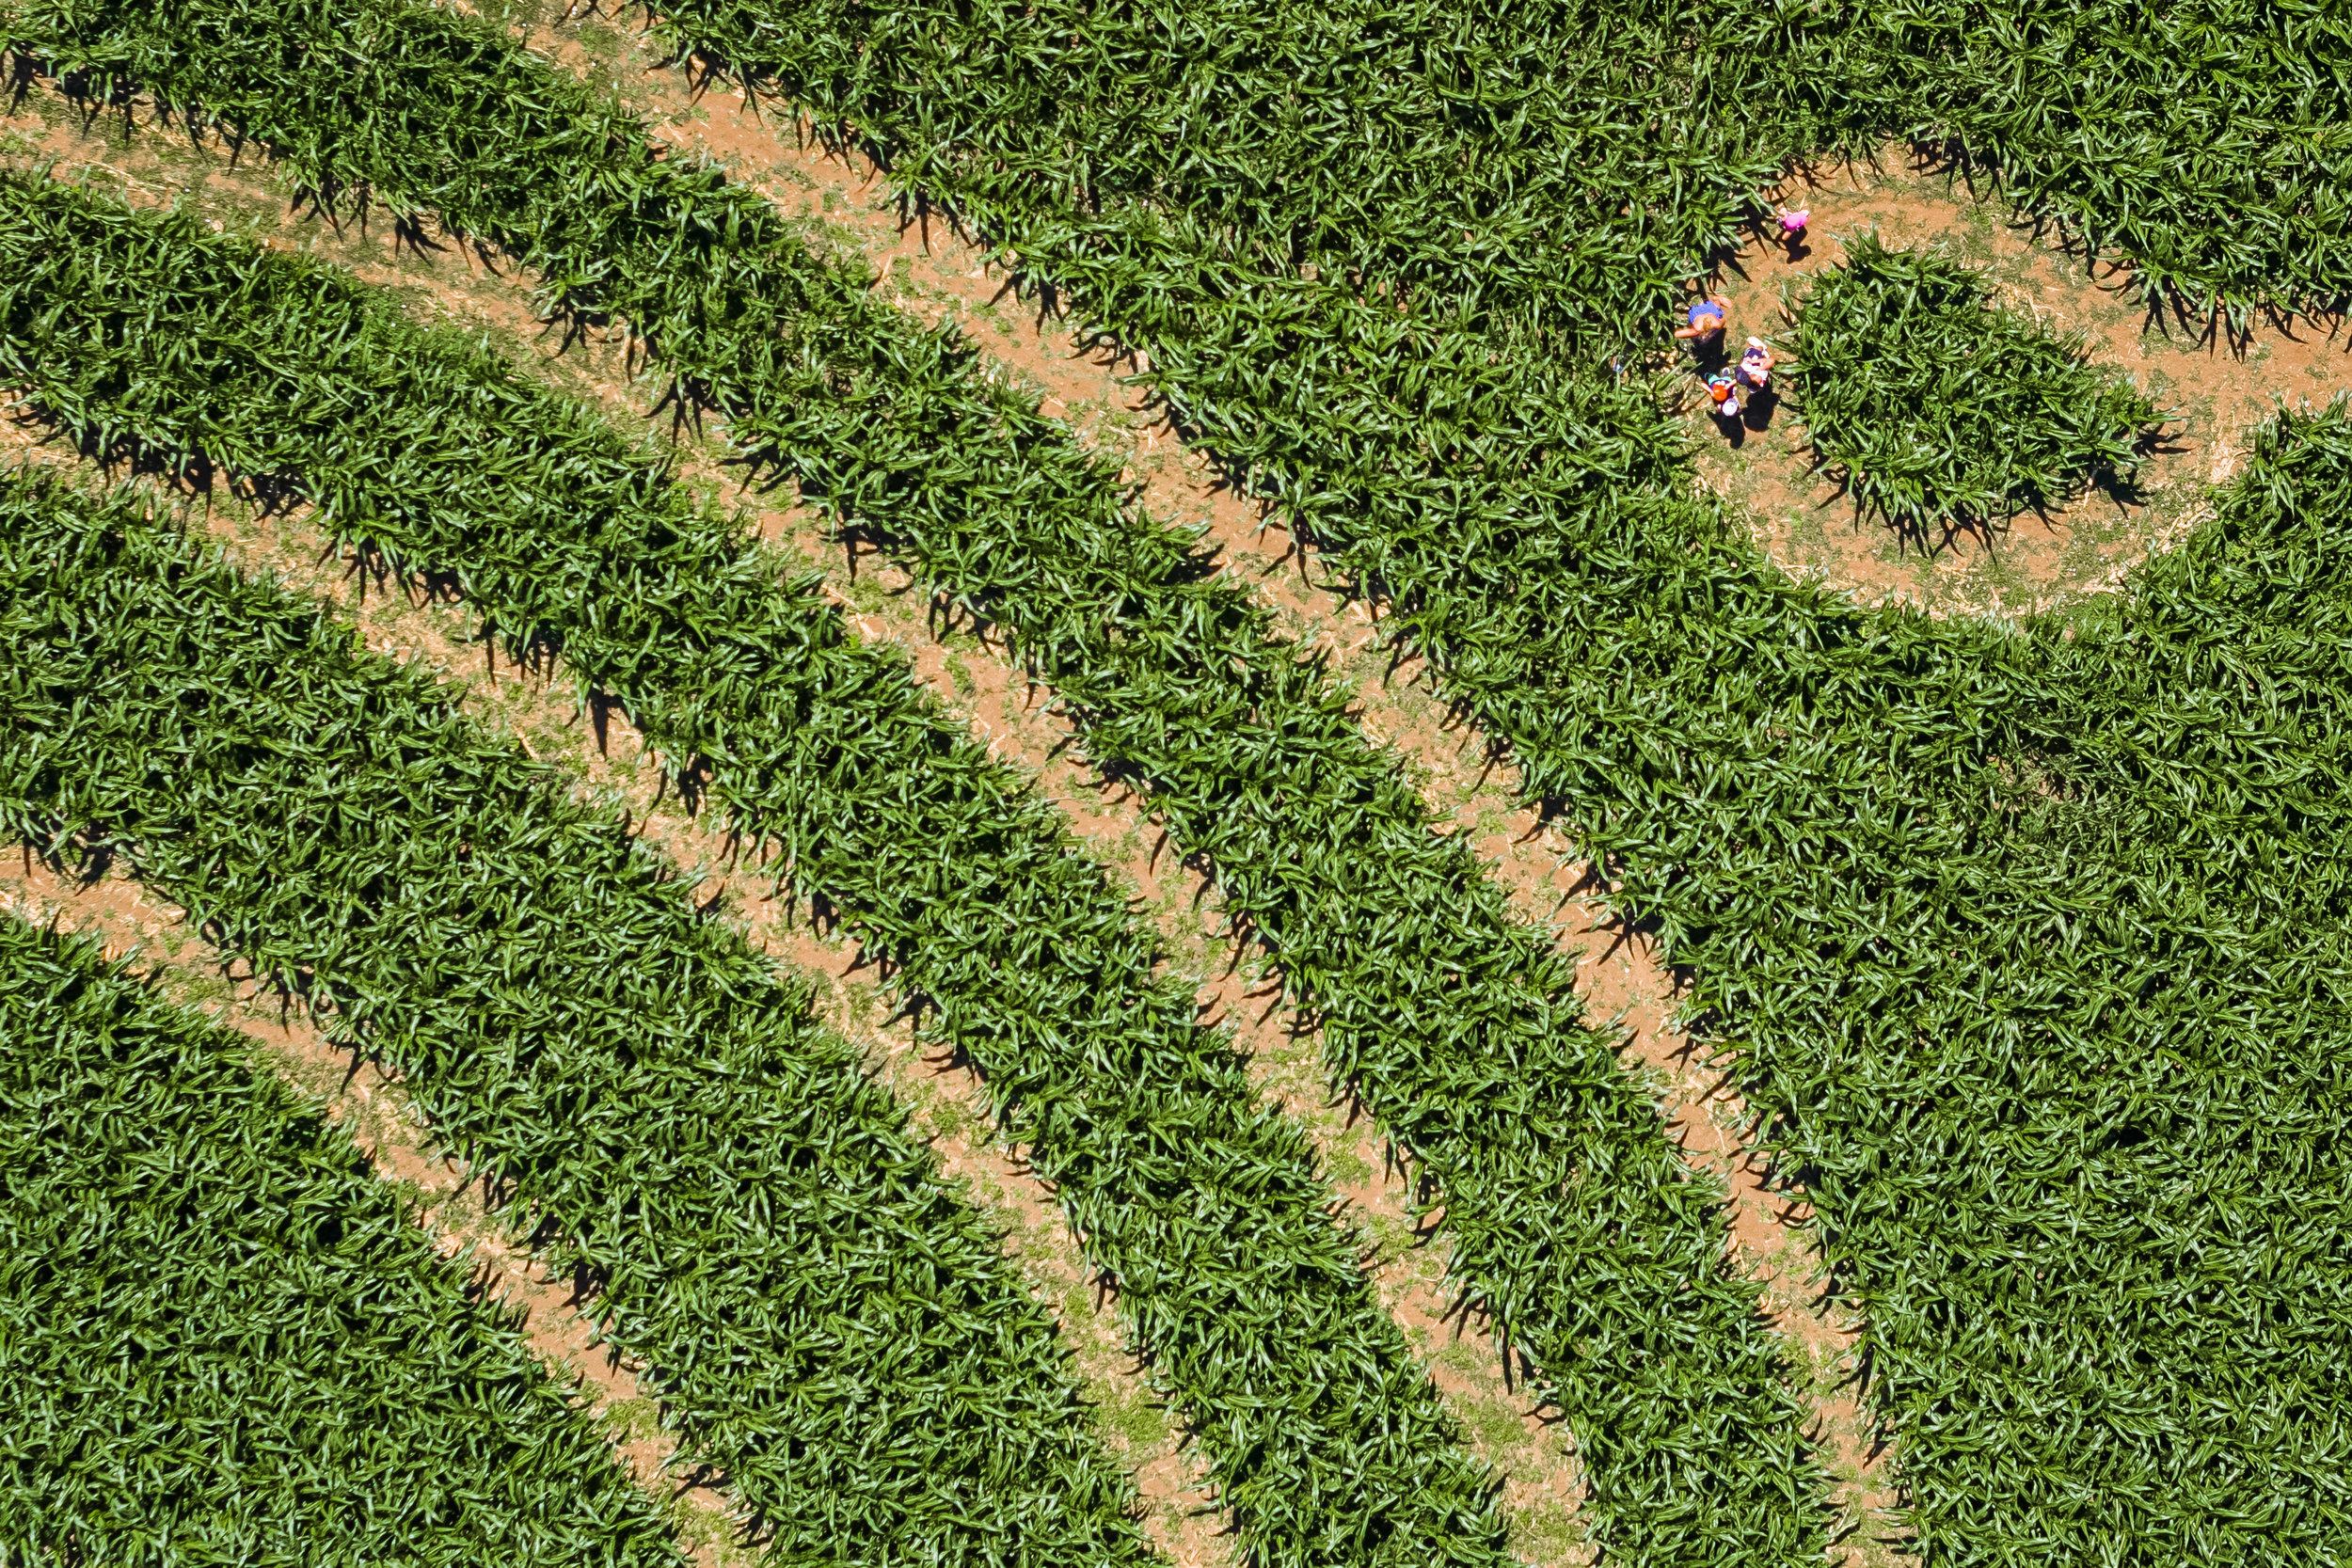 Visitors make their way through a 20'000 square-meter corn maze in Le Landeron in the Canton of Neuchatel, Switzerland, Switzerland, Sunday, July 1, 2018. (KEYSTONE/ Valentin Flauraud)